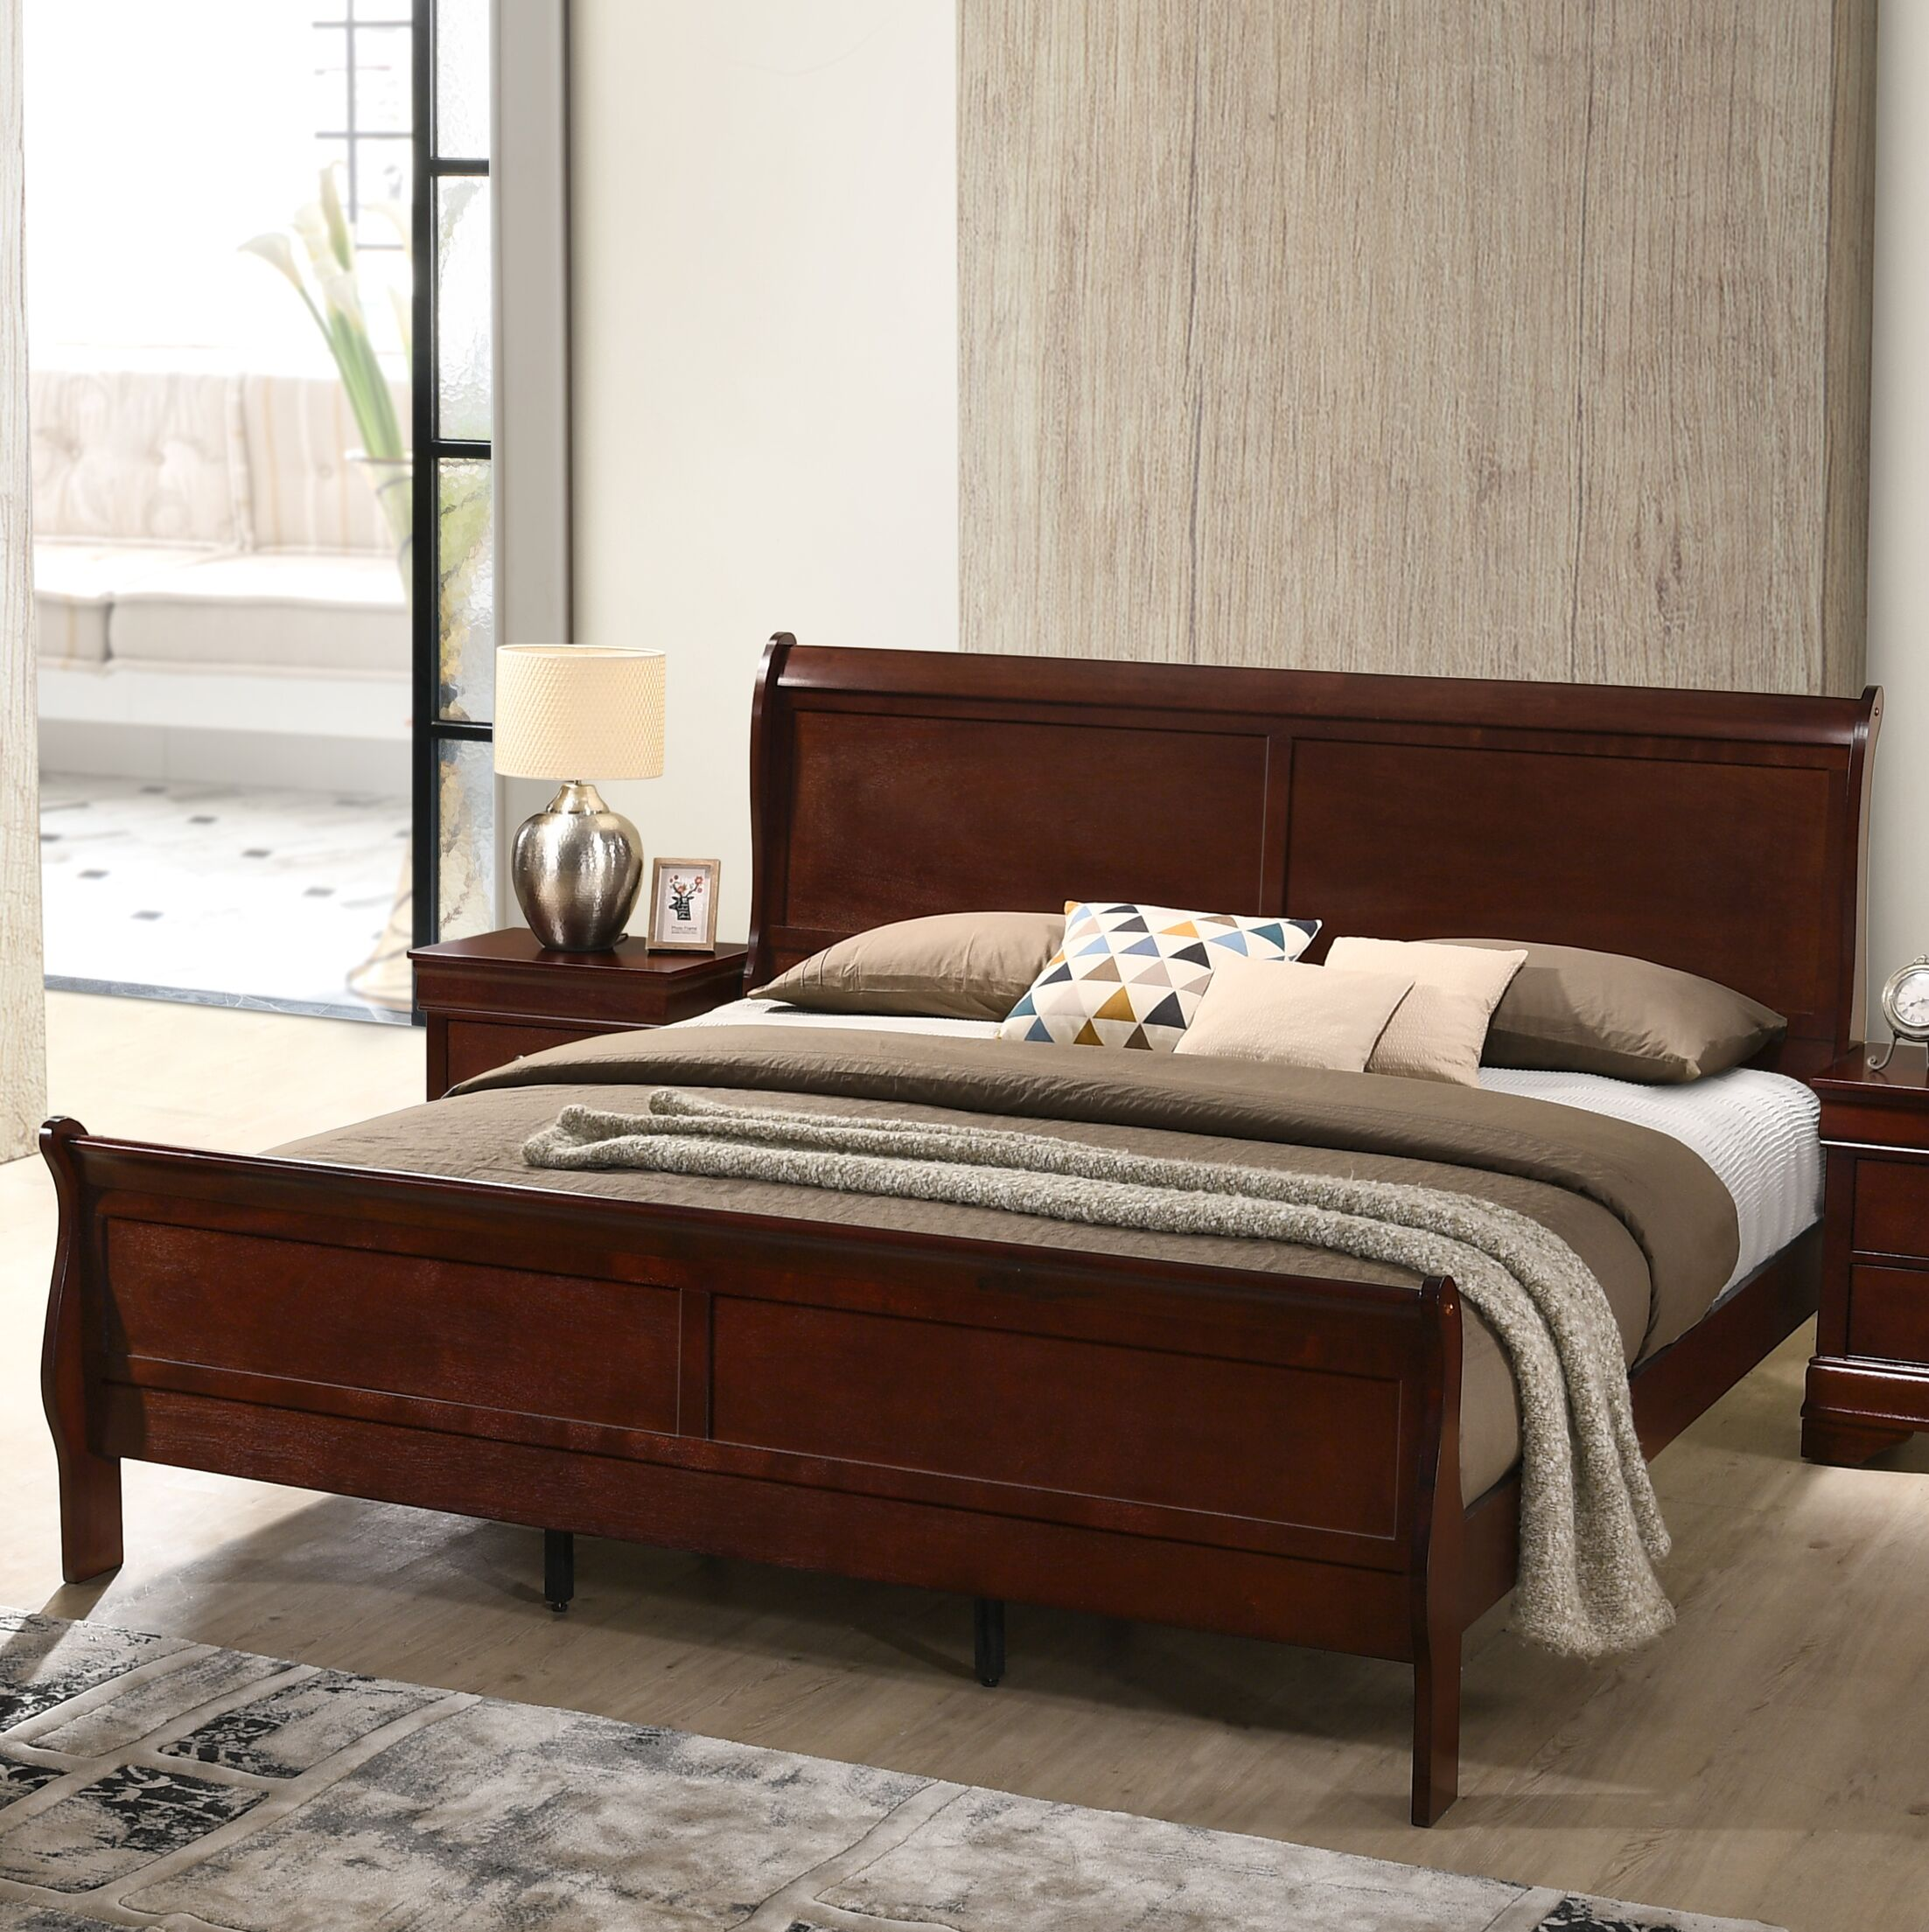 Braiden Sleigh 4 Piece Bedroom Set Size: Queen